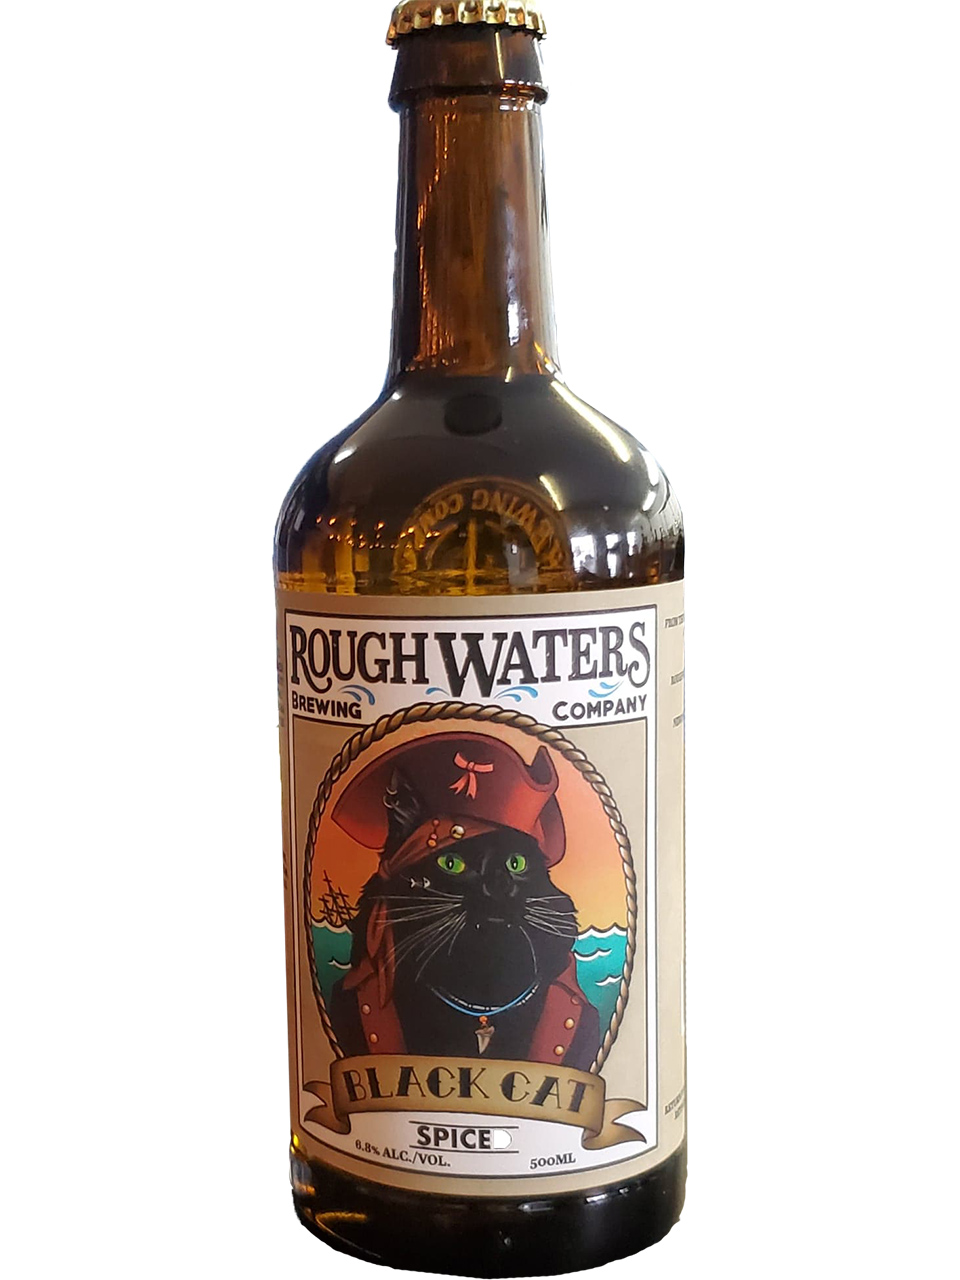 Rough Waters Black Cat 500ml Bottle